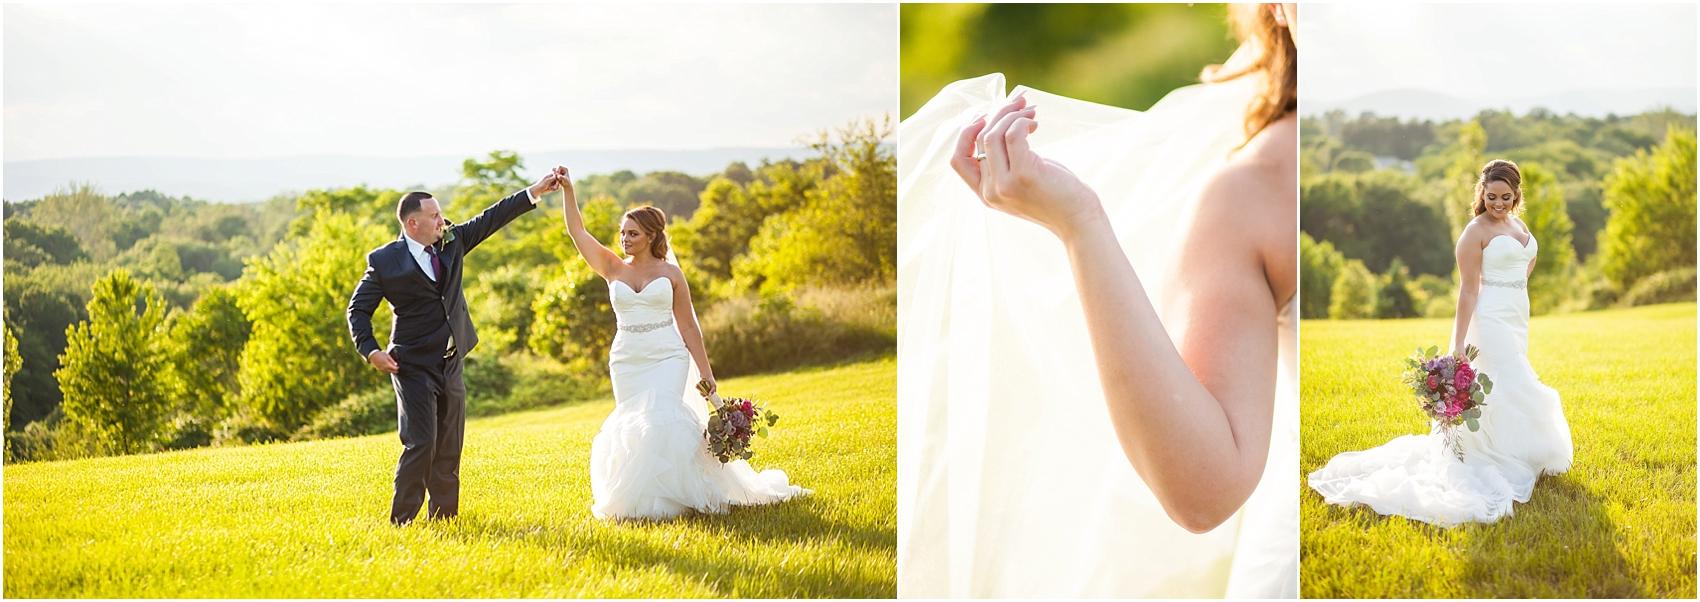 Blue Valley Winery Wedding Feather n Oak Photography_0014.jpg